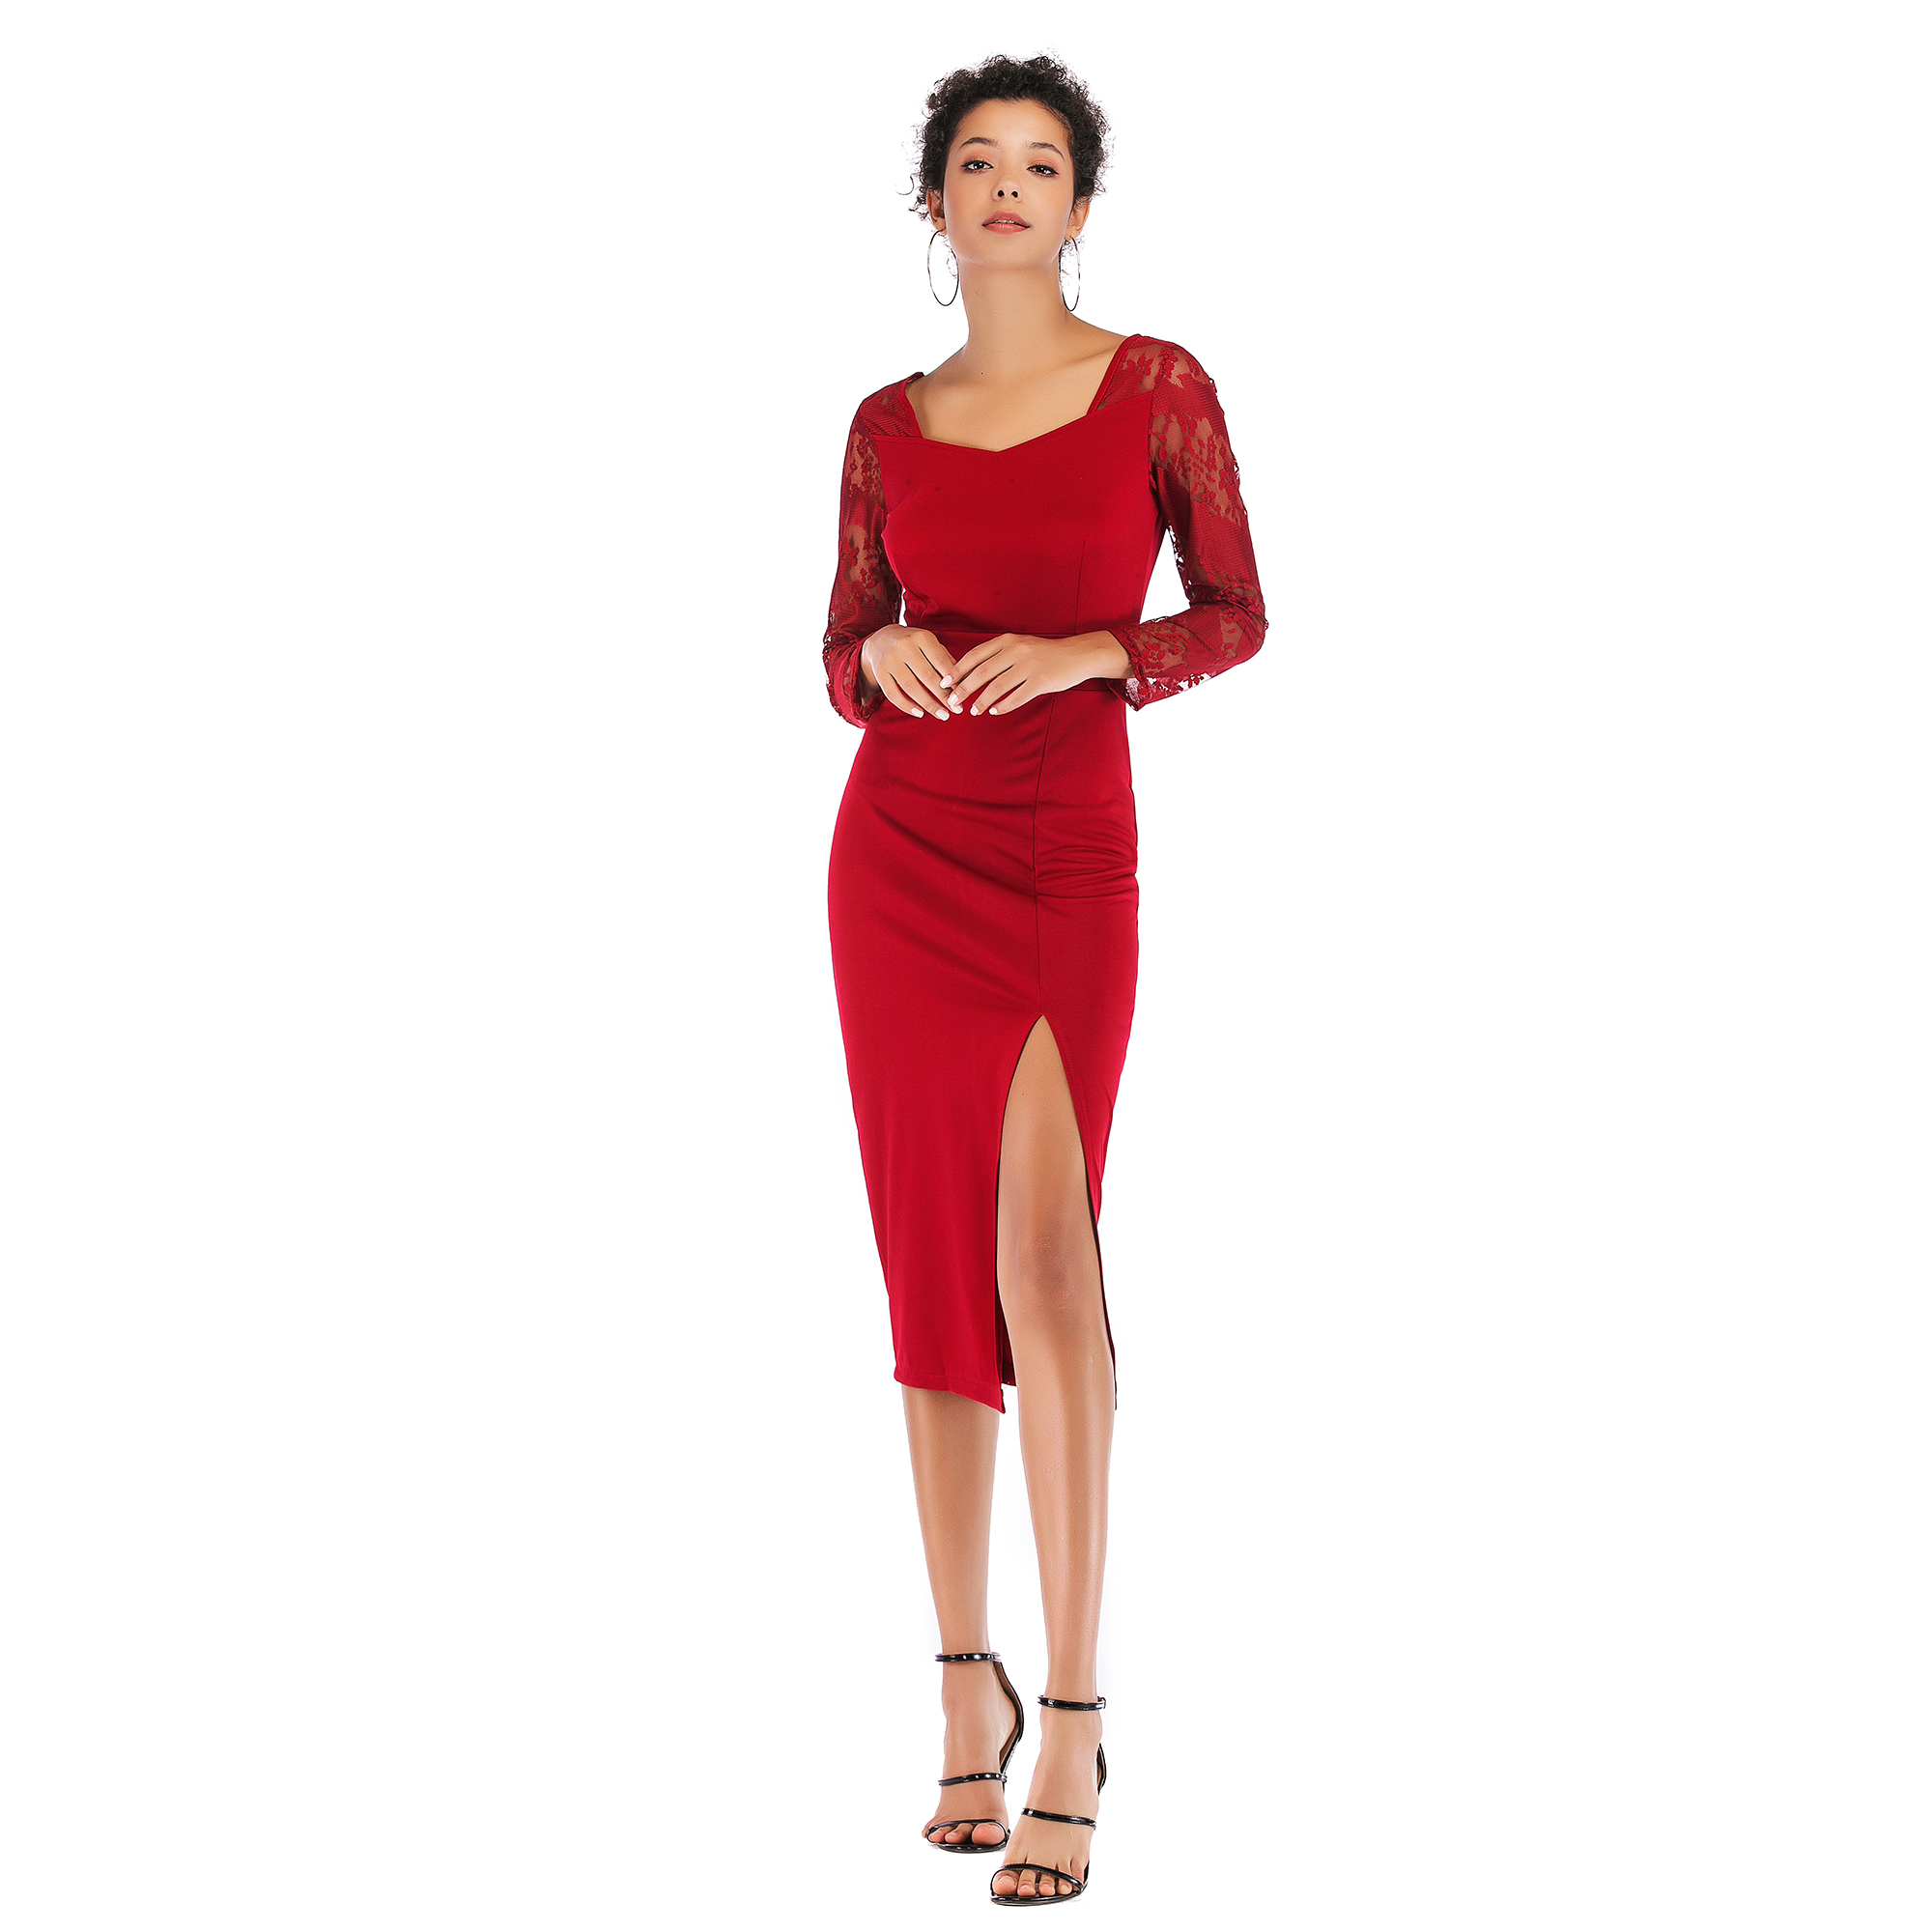 5935 ebay速卖通秋冬款欧美蕾丝拼接袖包臀裙性感开叉纯色铅笔裙